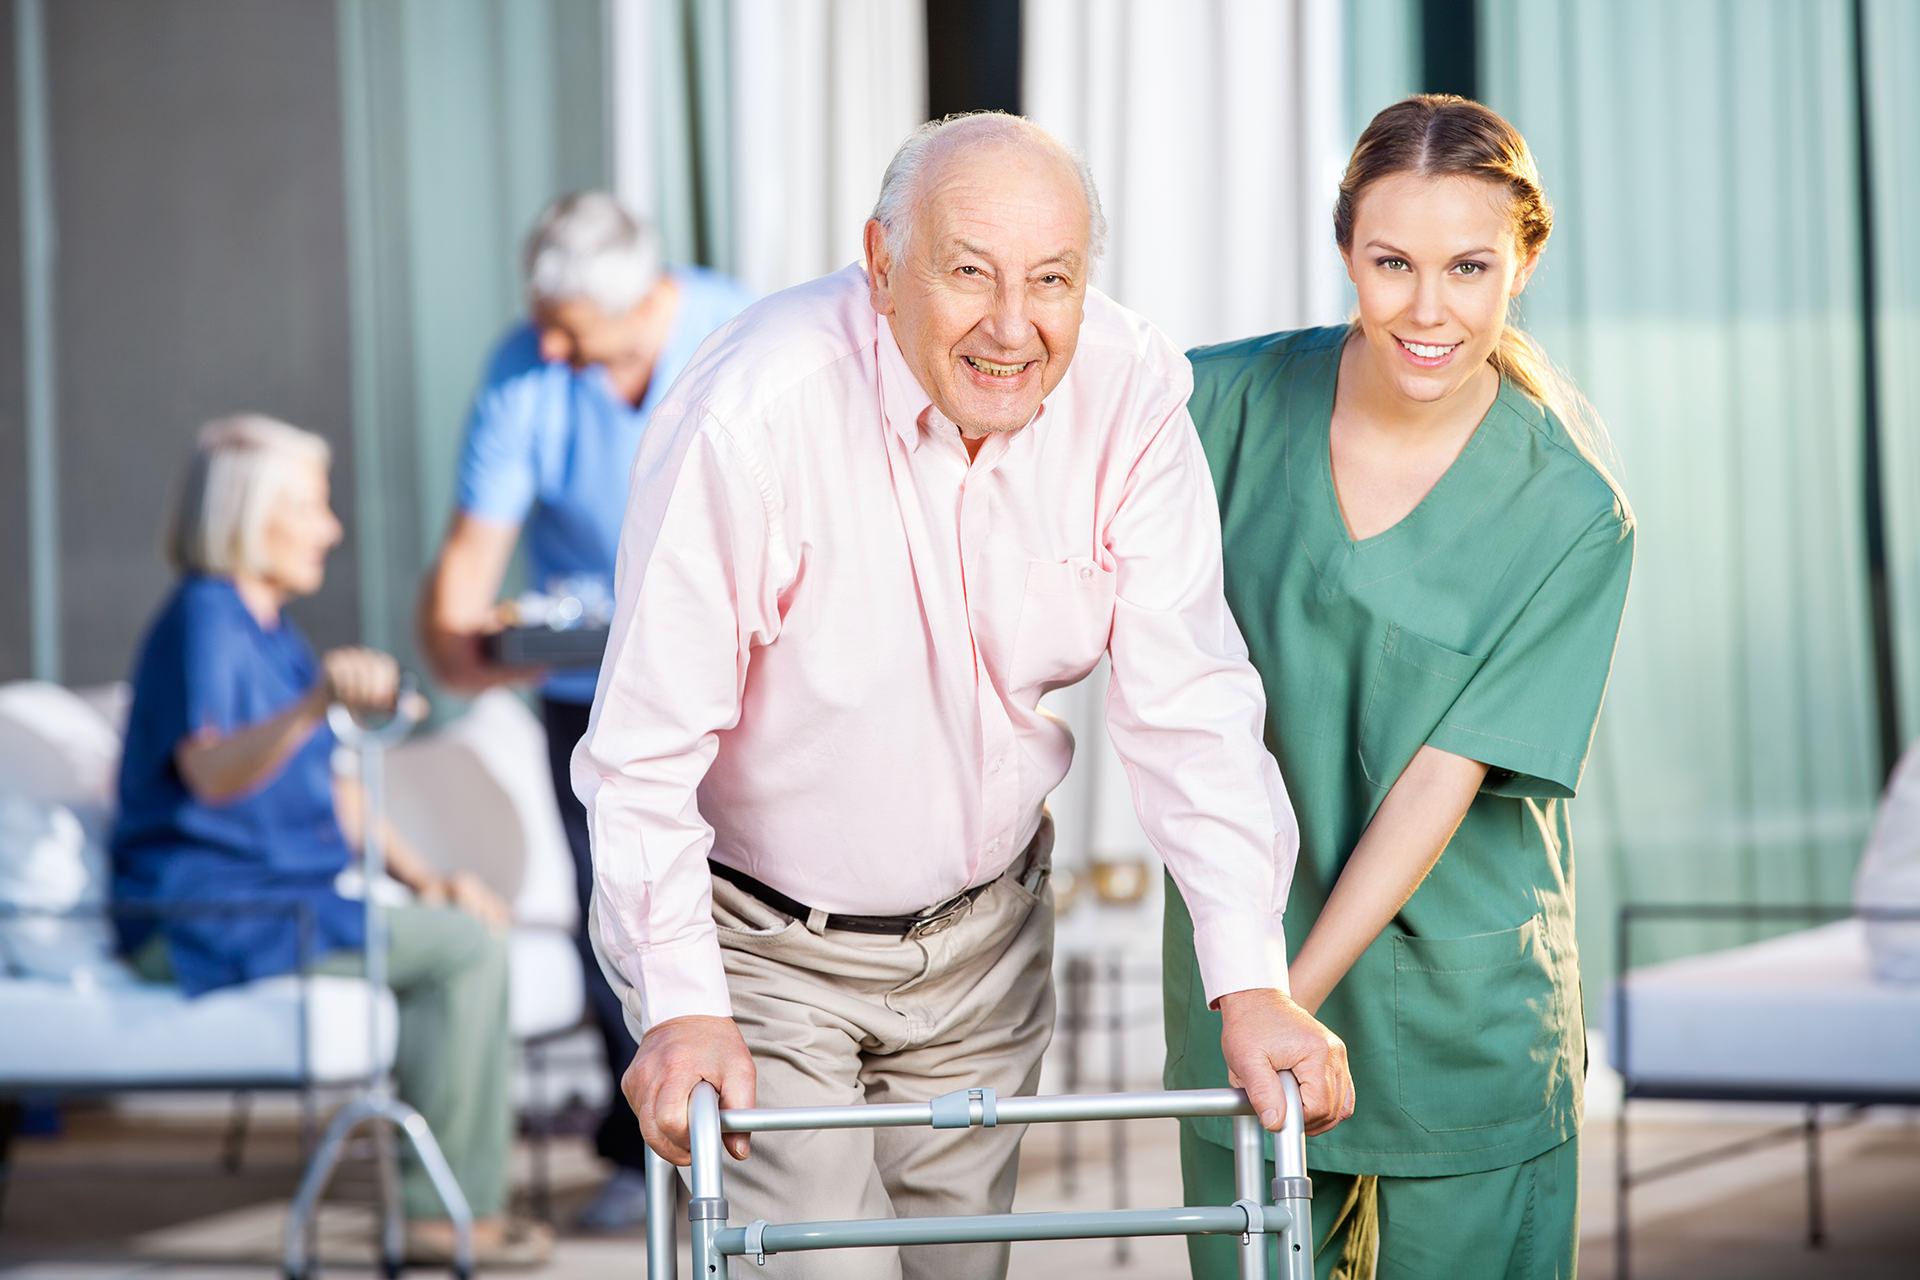 Caregiver Female Helping Senior Man